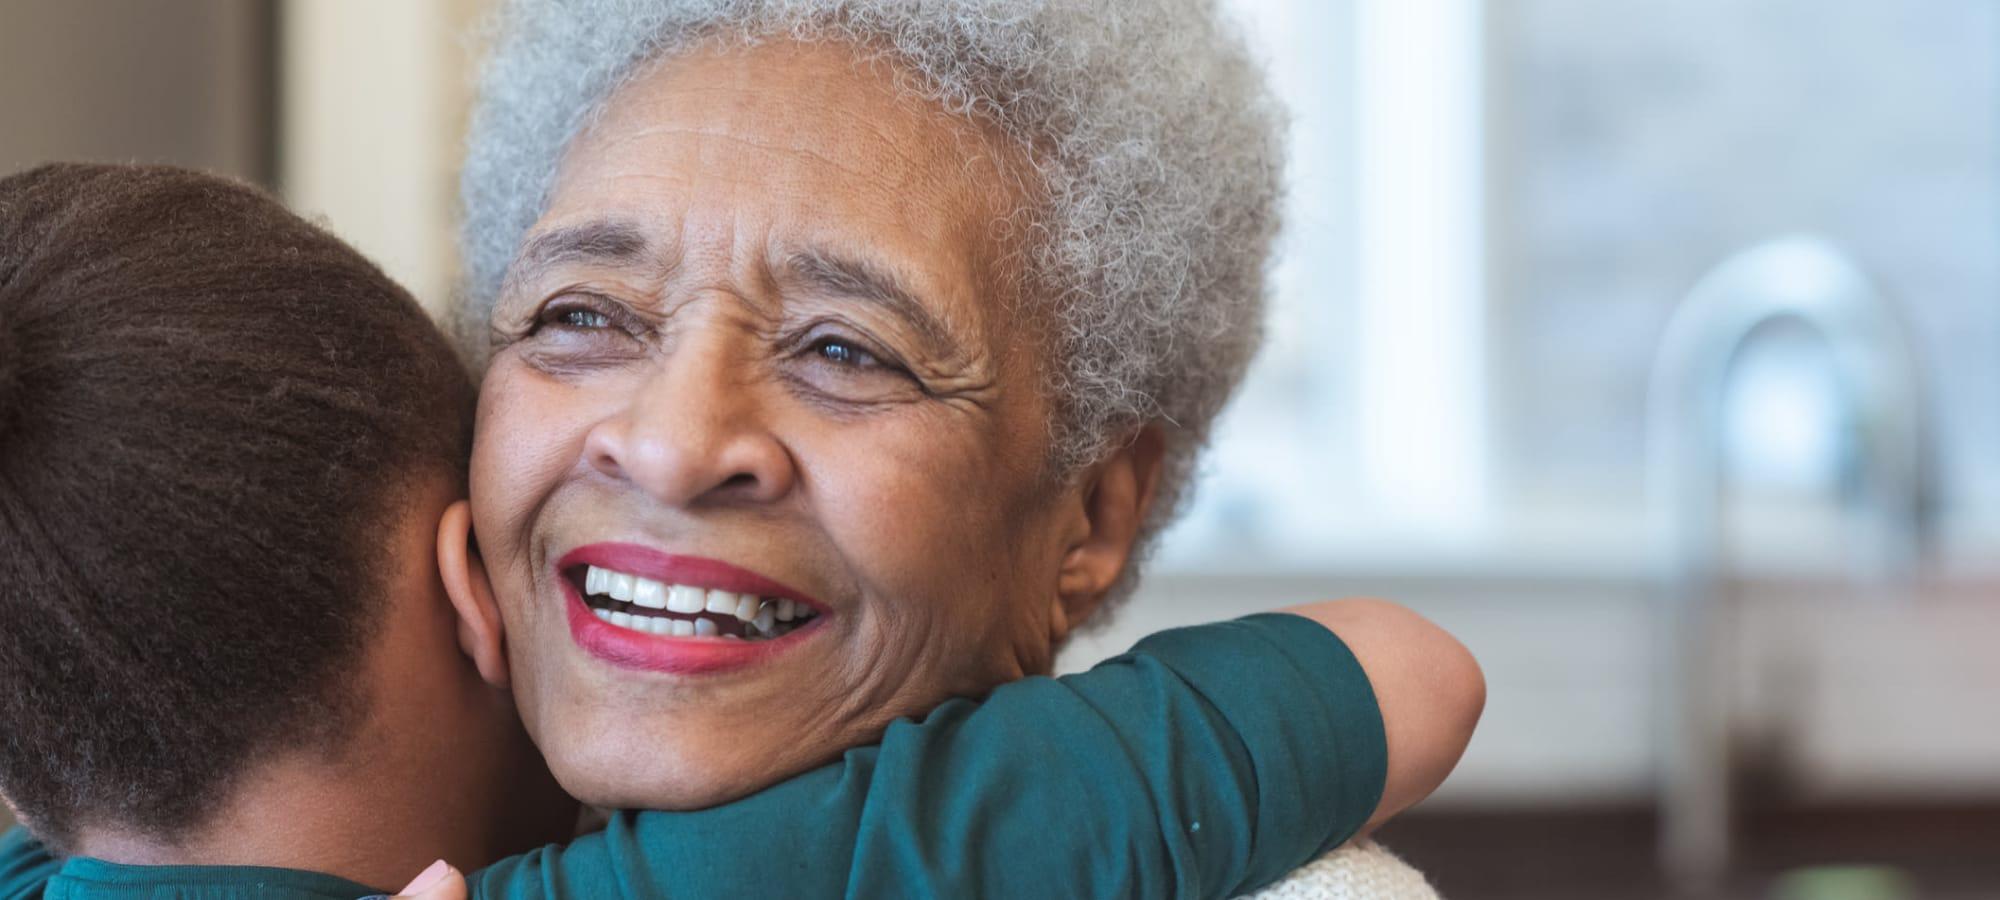 Senior living community options at Broadwell Senior Living in Kearney, Nebraska